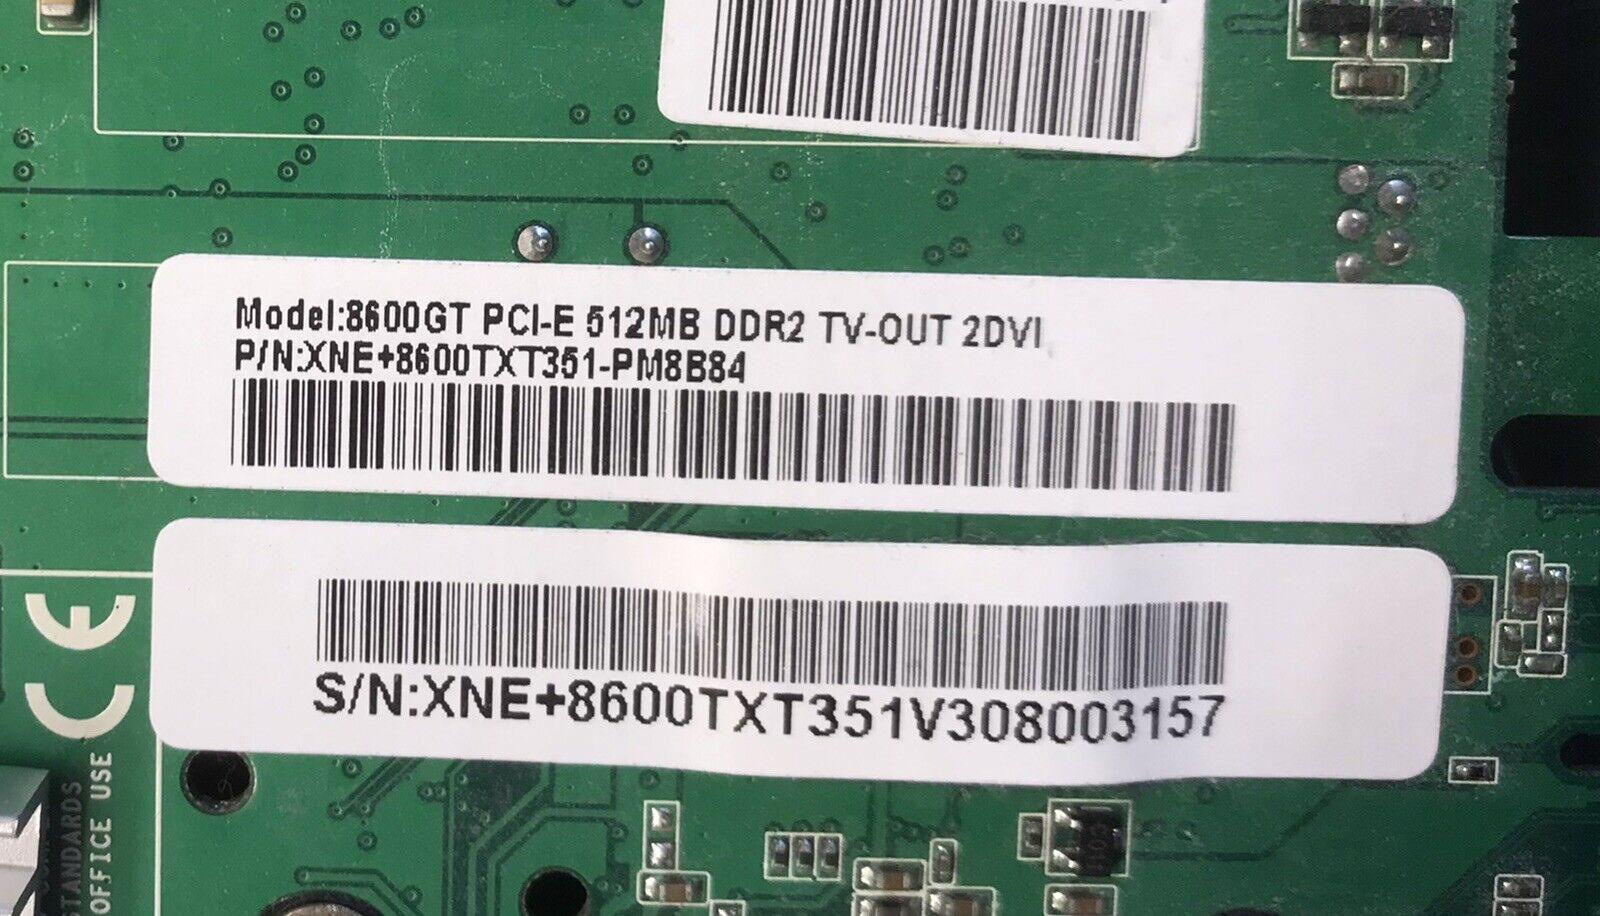 512MB Xpertvision XNE 8600GT + 8600TXT351